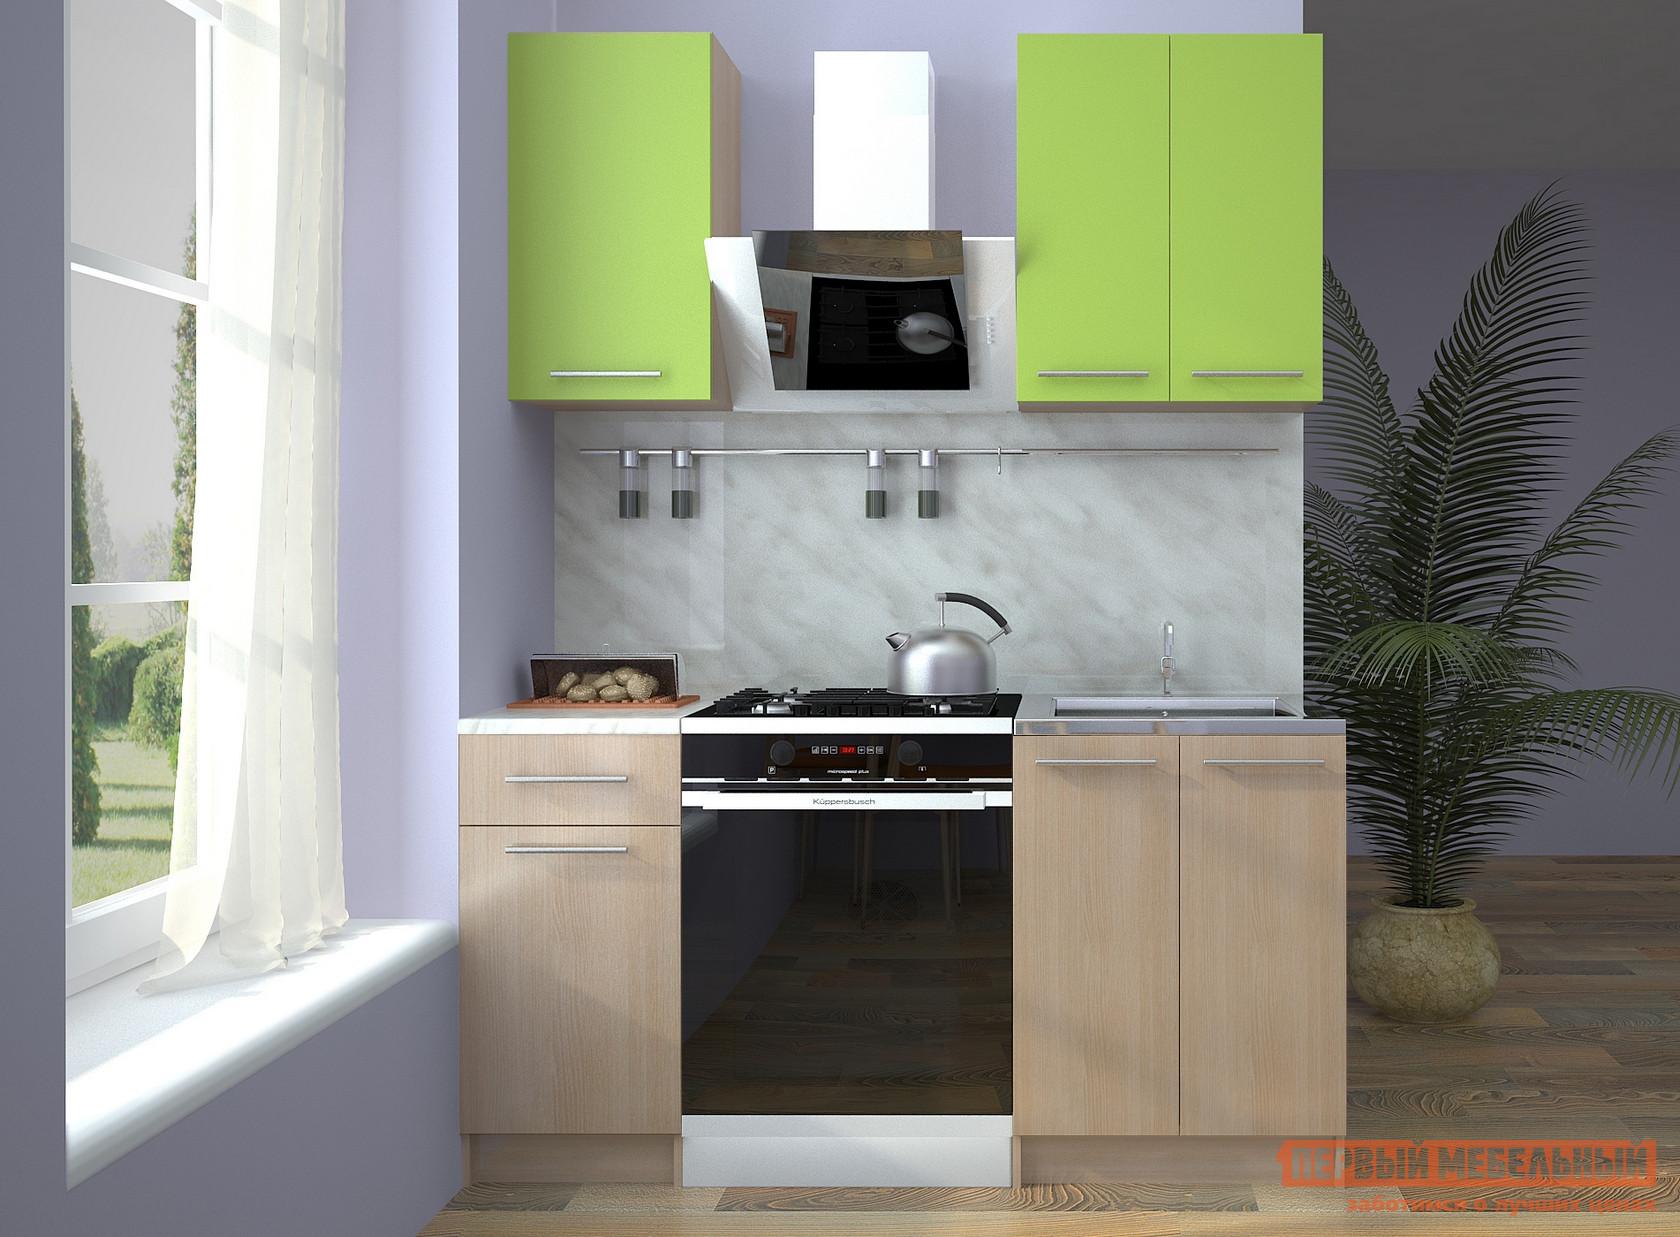 Кухонный гарнитур НК-Мебель Далари 100 см сурская мебель кухонный гарнитур настя 11